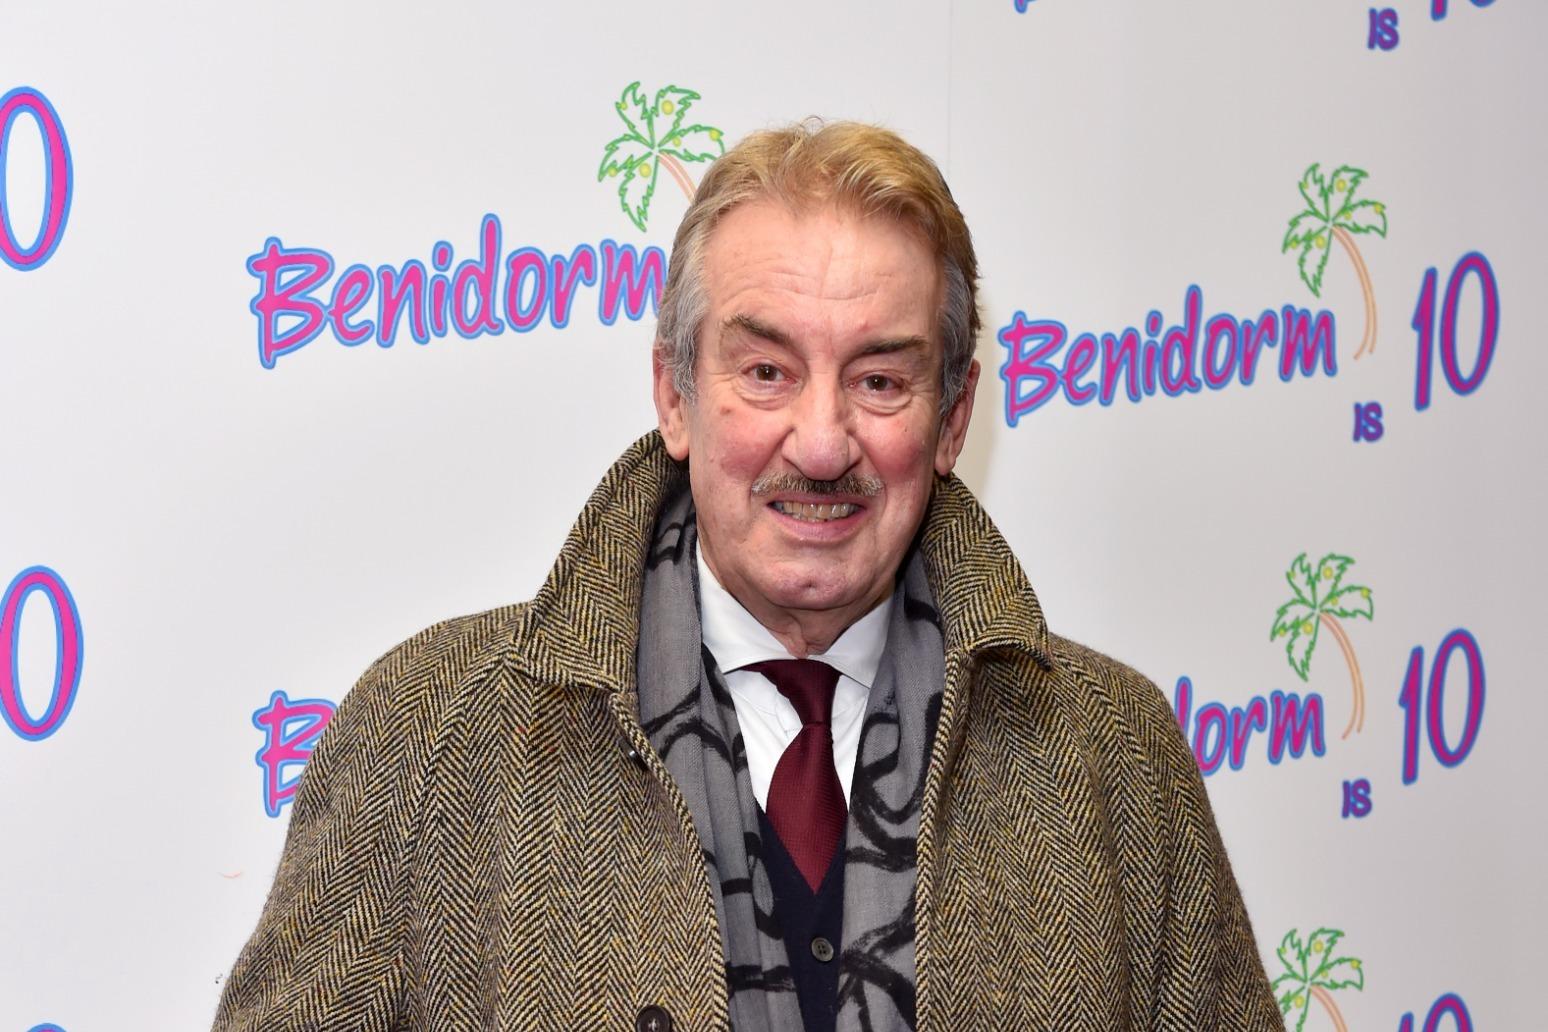 Only Fools cast members praise 'beloved friend' and 'gentleman' John Challis.